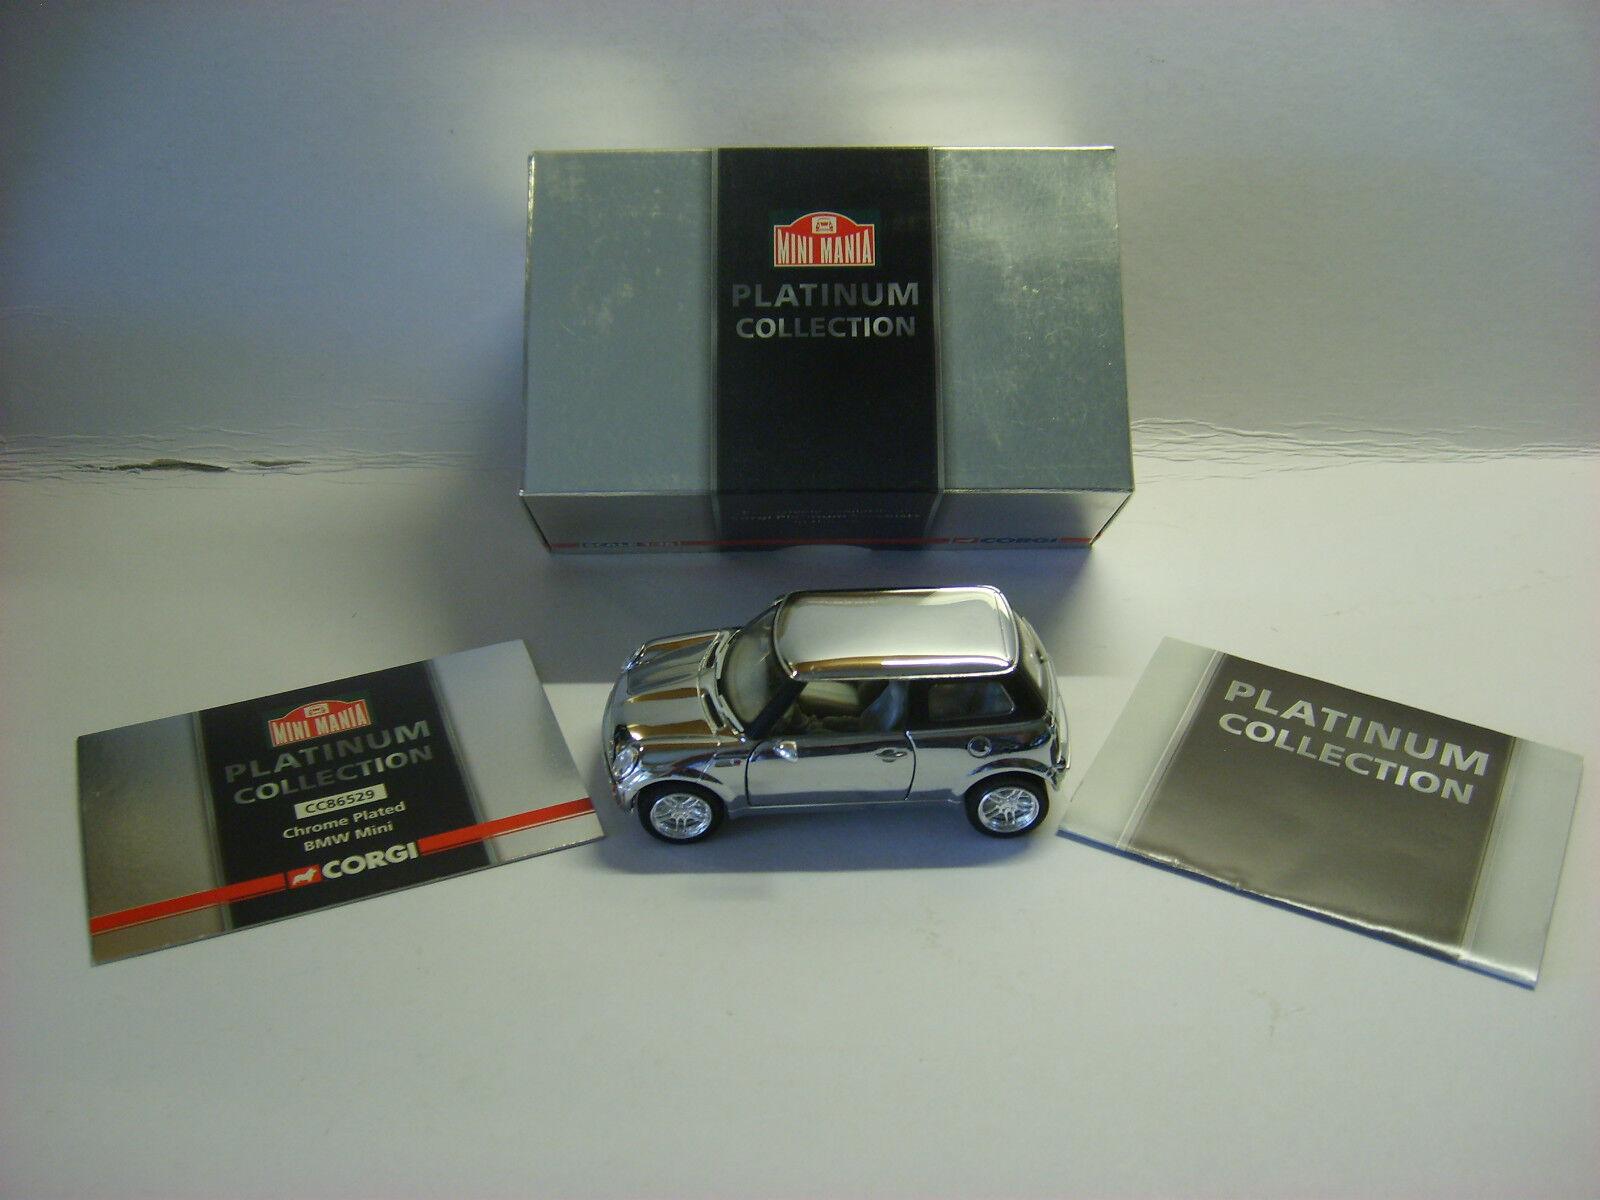 Envio gratis en todas las ordenes Corgi-CC86529-BMW Mini Mini Mini en Chrome  Platinum Coll  1 36 Escala  inicial del segundo nombre. B.  Descuento del 70% barato